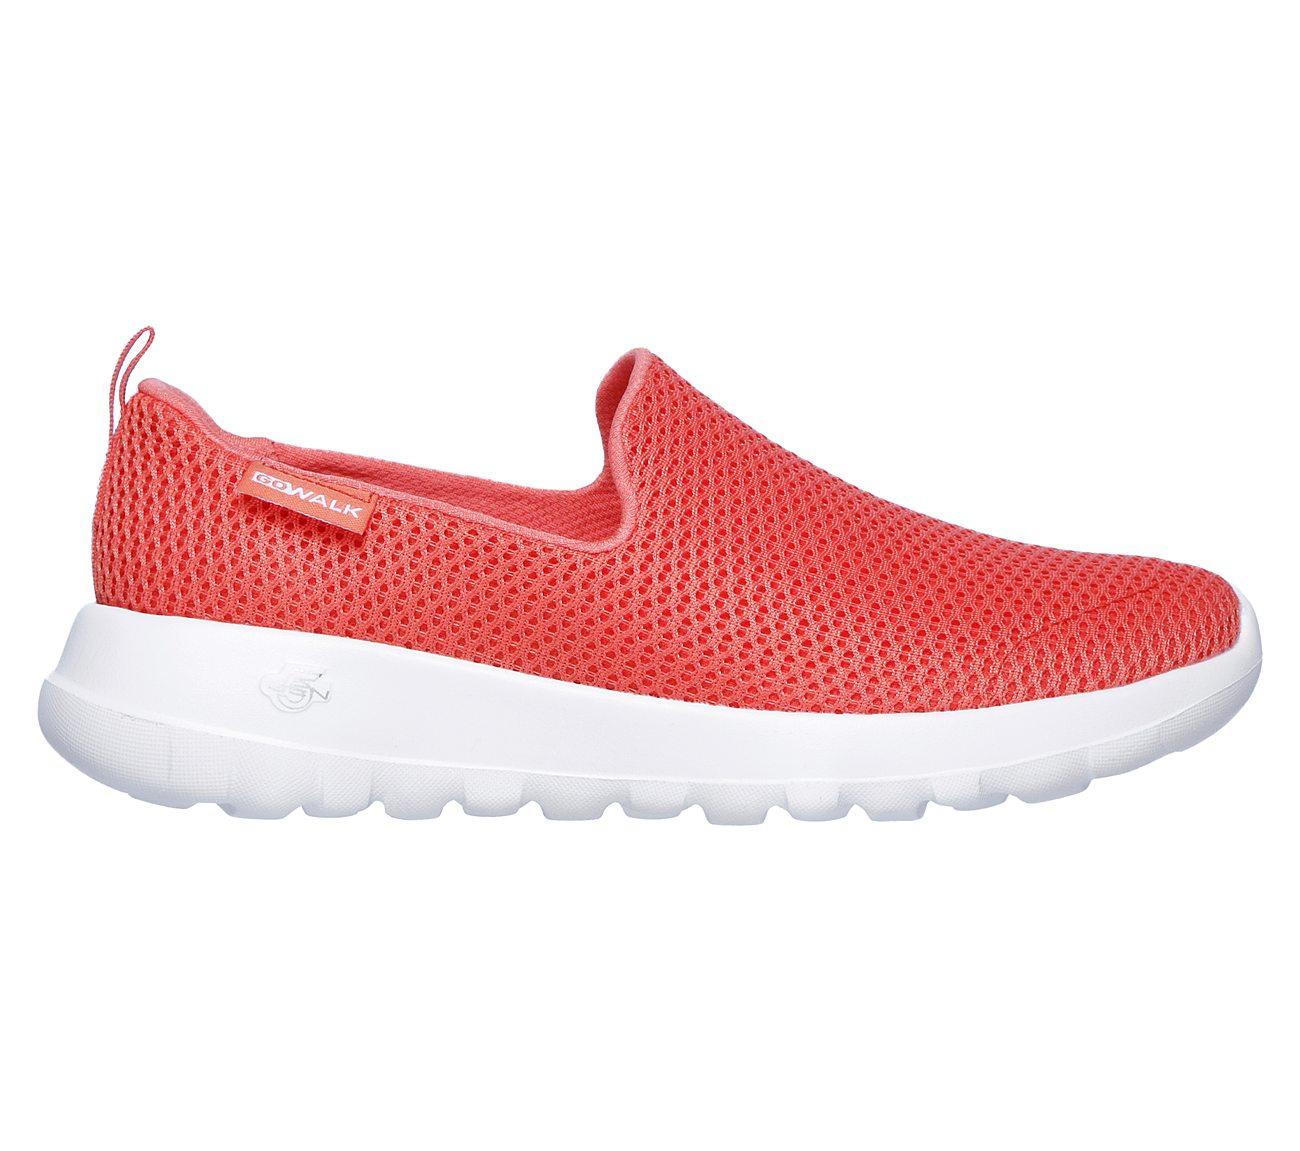 15600 Coral Skechers shoes Go Walk Joy Cool Women Mesh Slipon Comfort Casual New